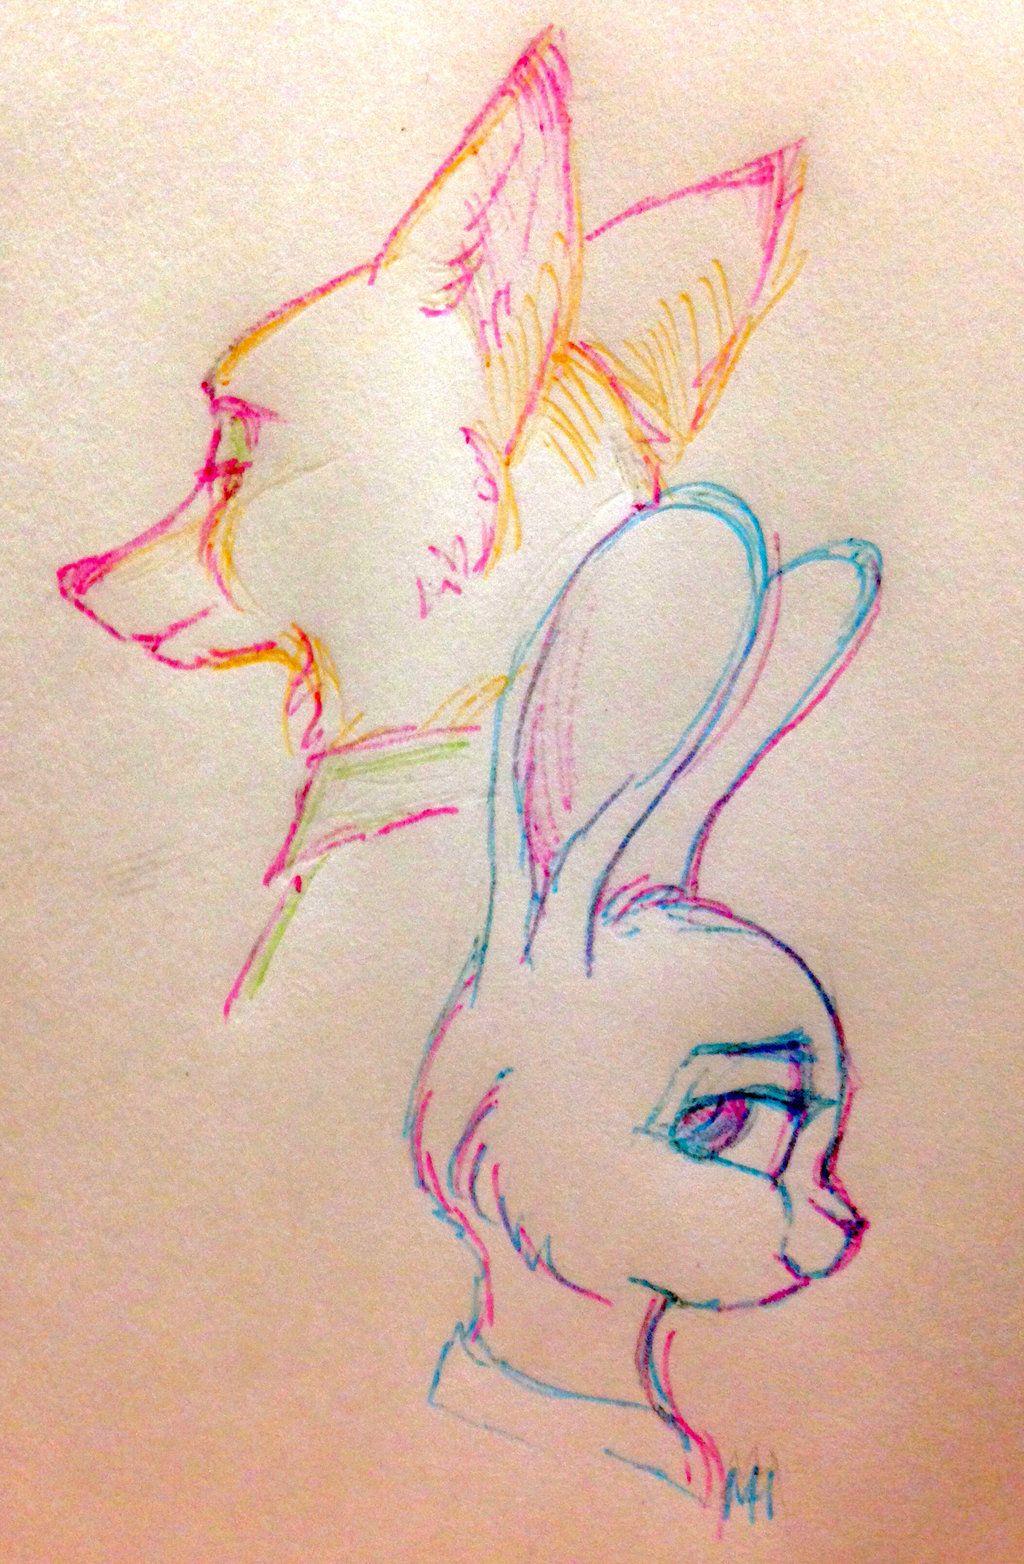 [Sketch] Zootopia by Nelchonok.deviantart.com on @DeviantArt